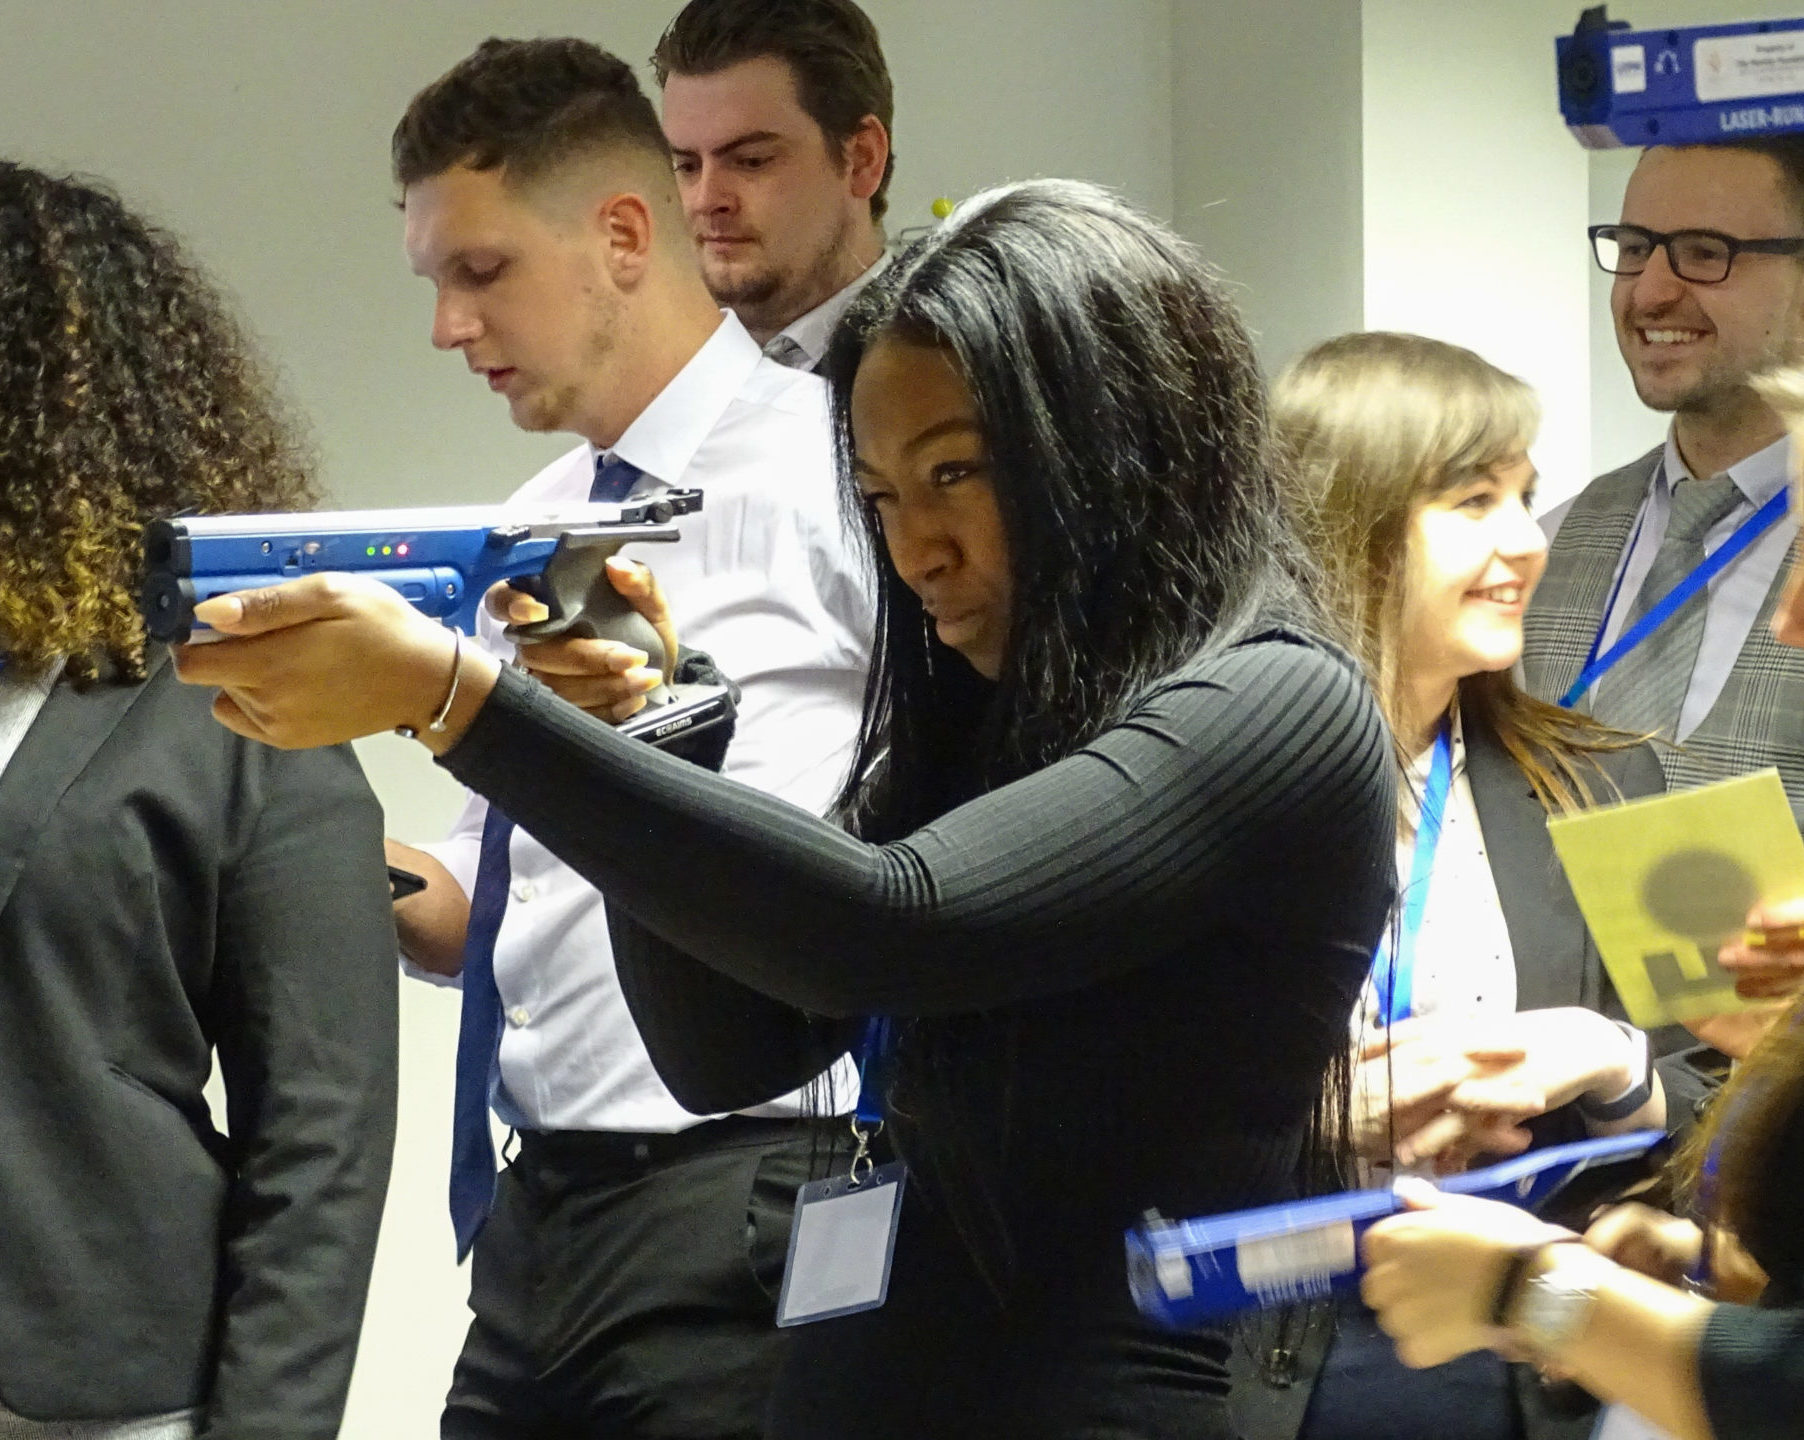 Take off 2020 gun girl at apprenticeship event